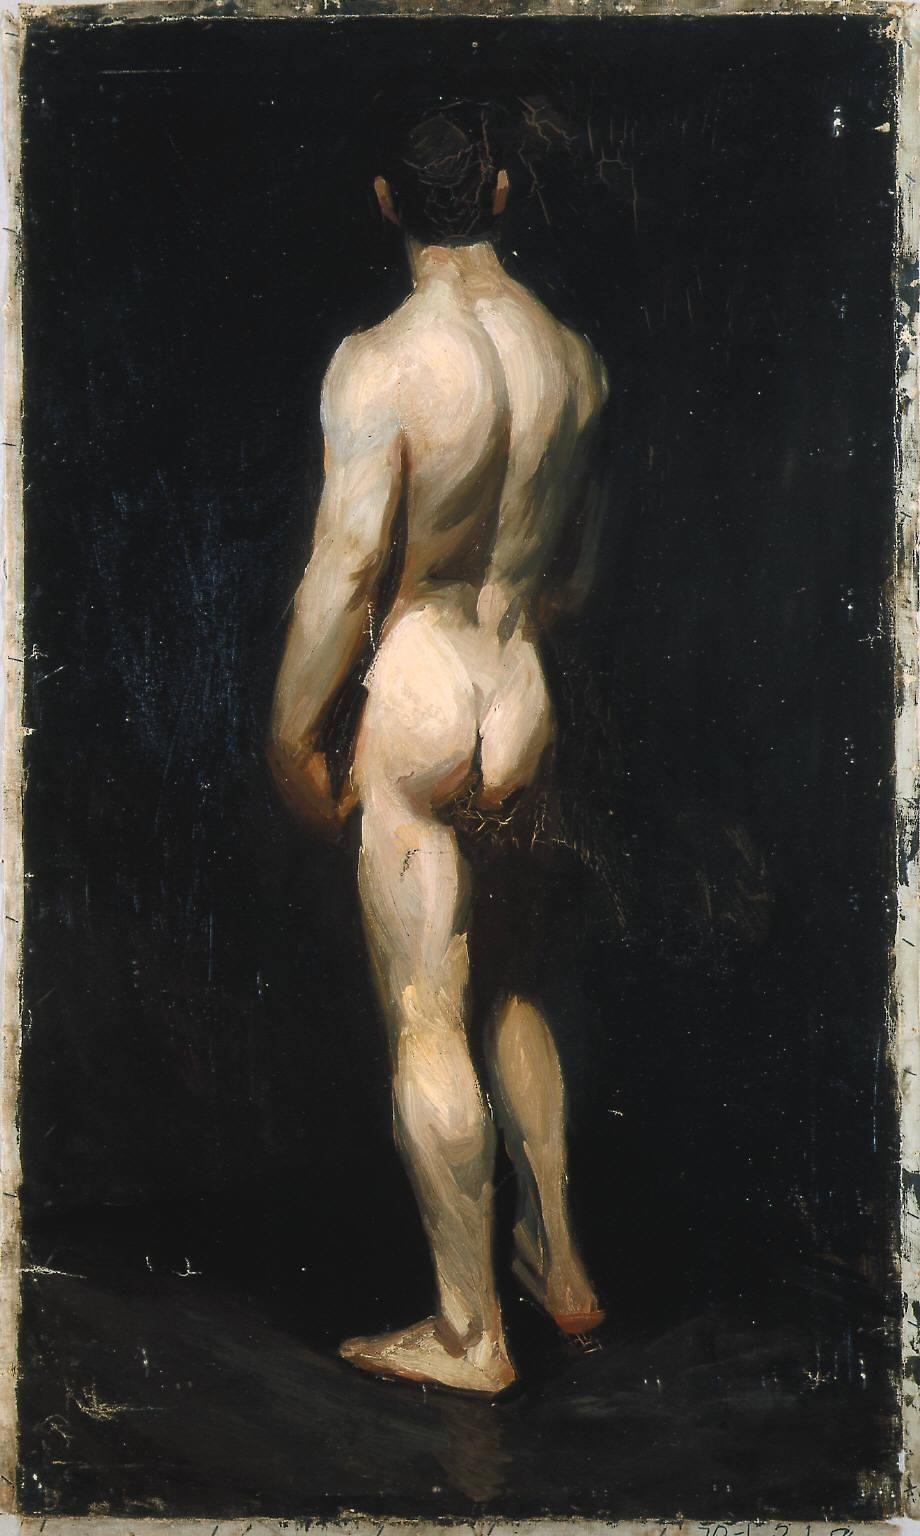 from Makai edward gay paintings